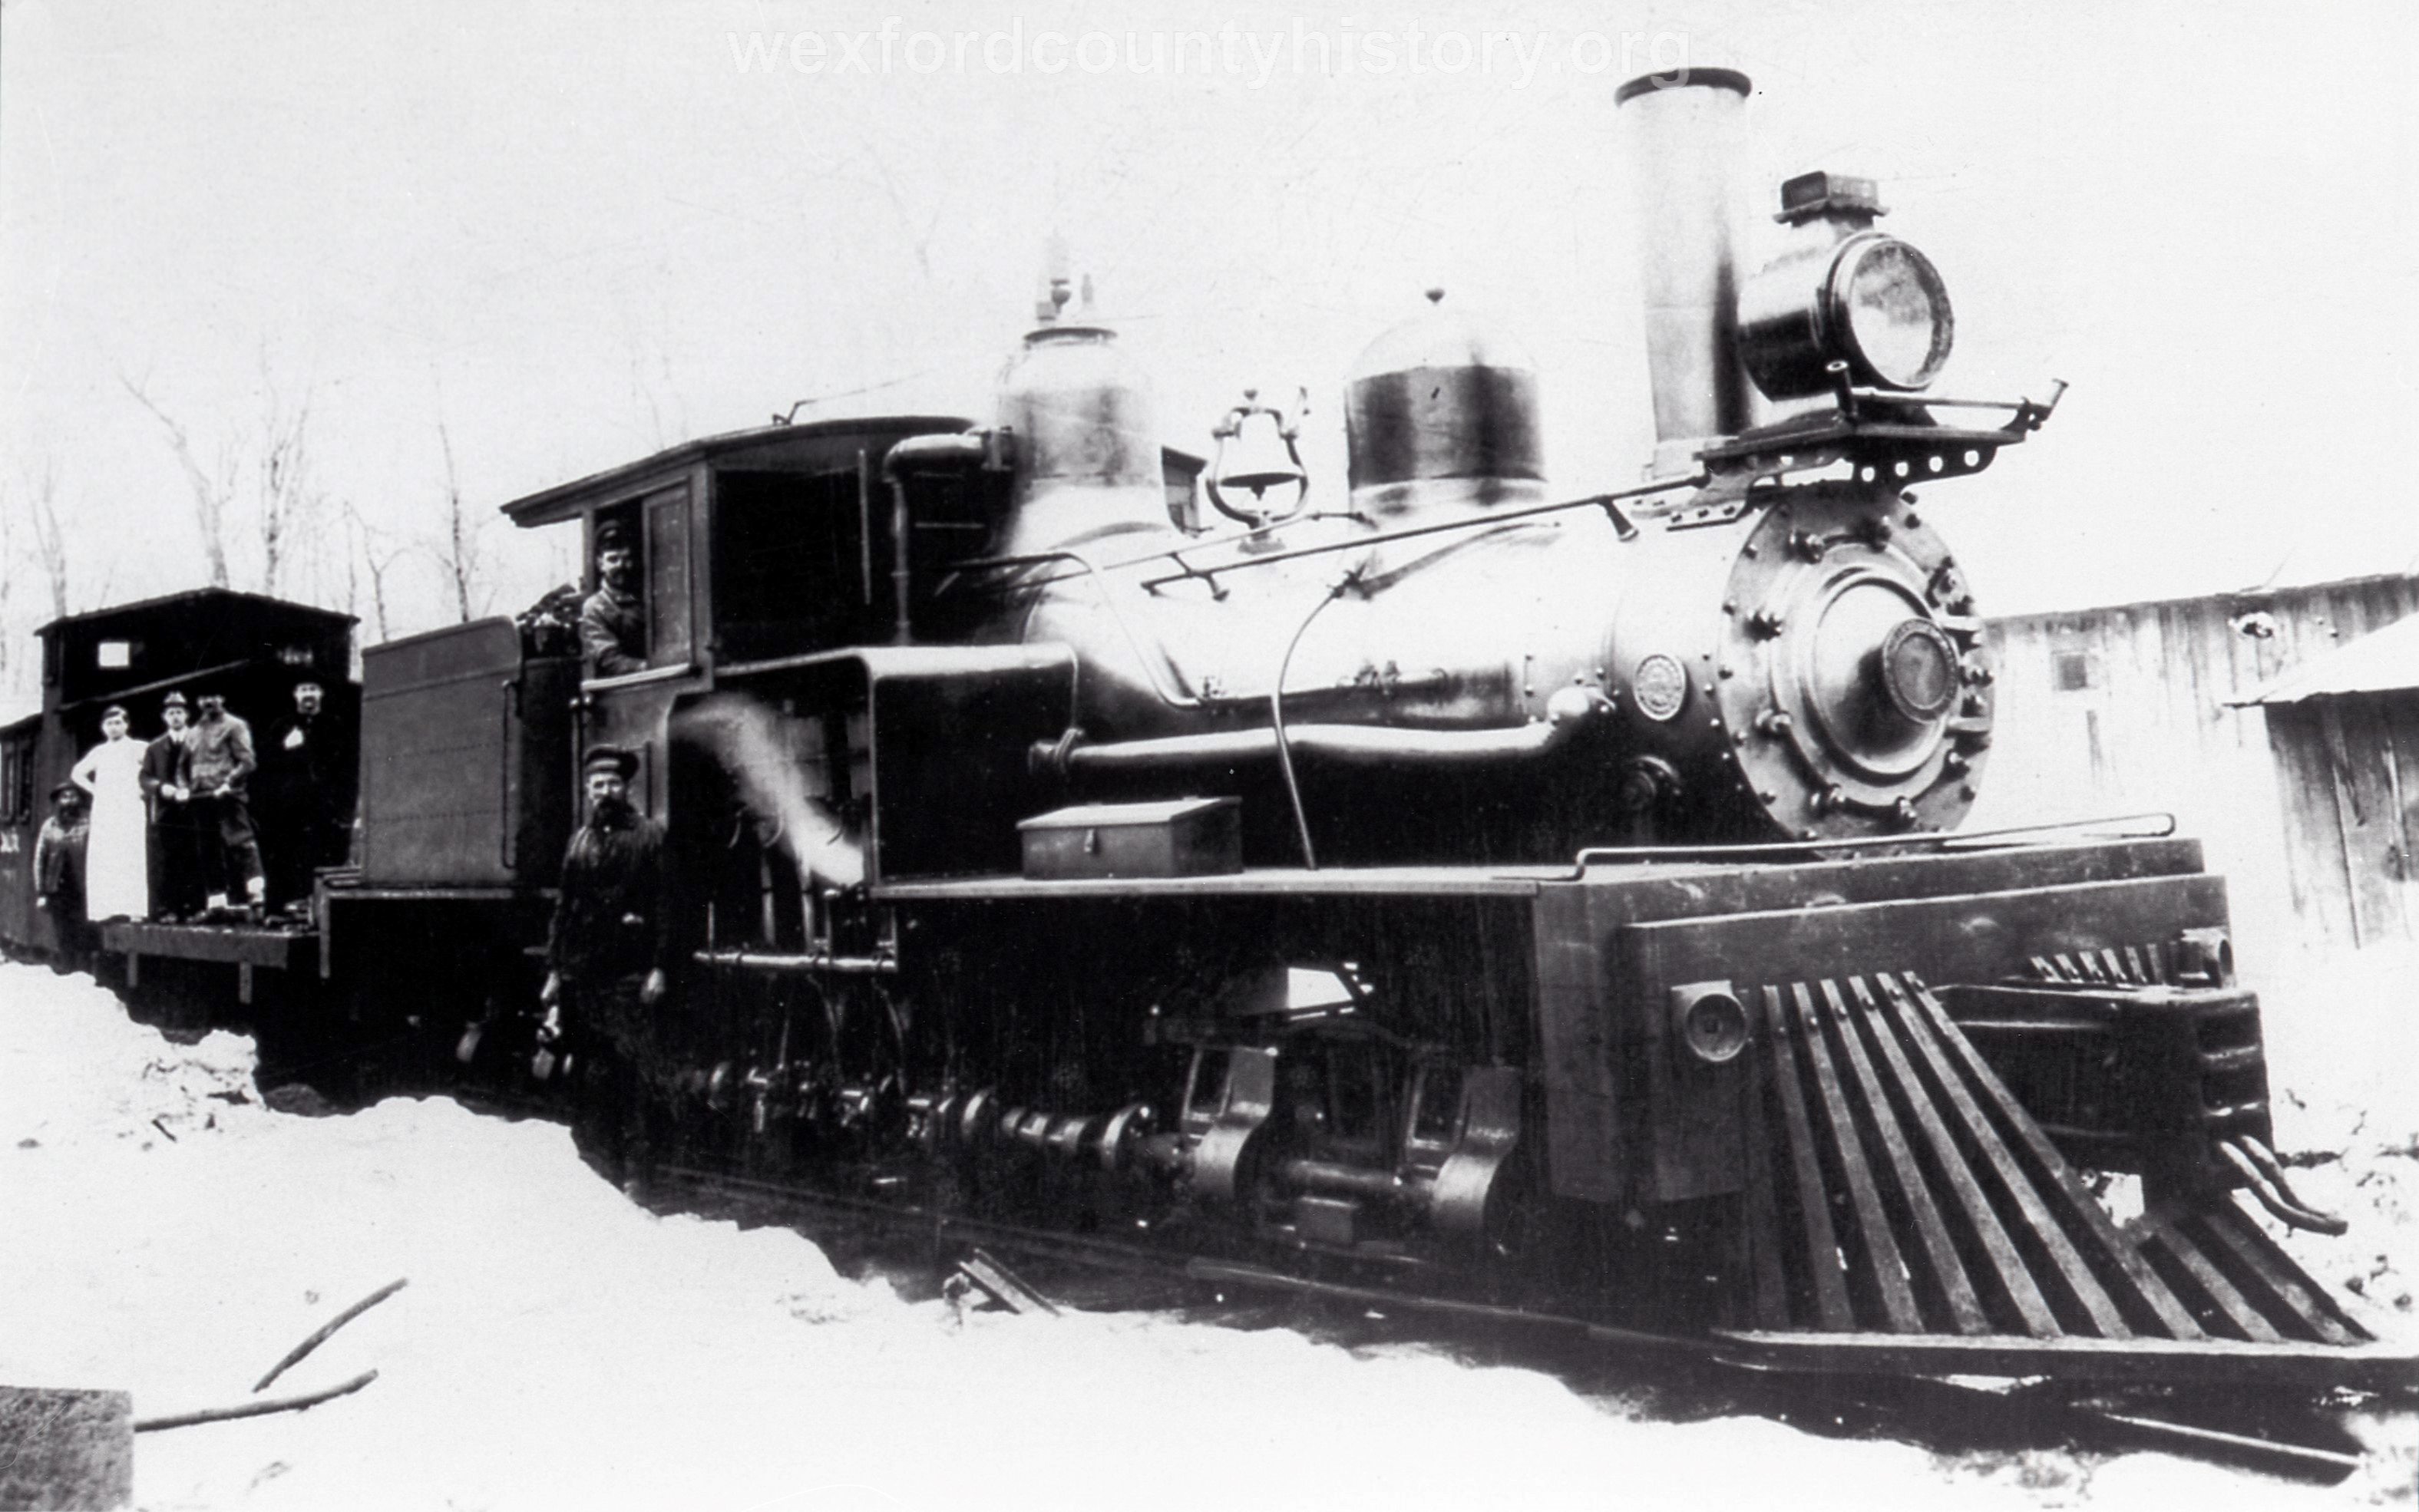 Cadillac-Railroad-Loco-7-Shay-unk-RR-Cadillac-Mike-Hankwitz-collection